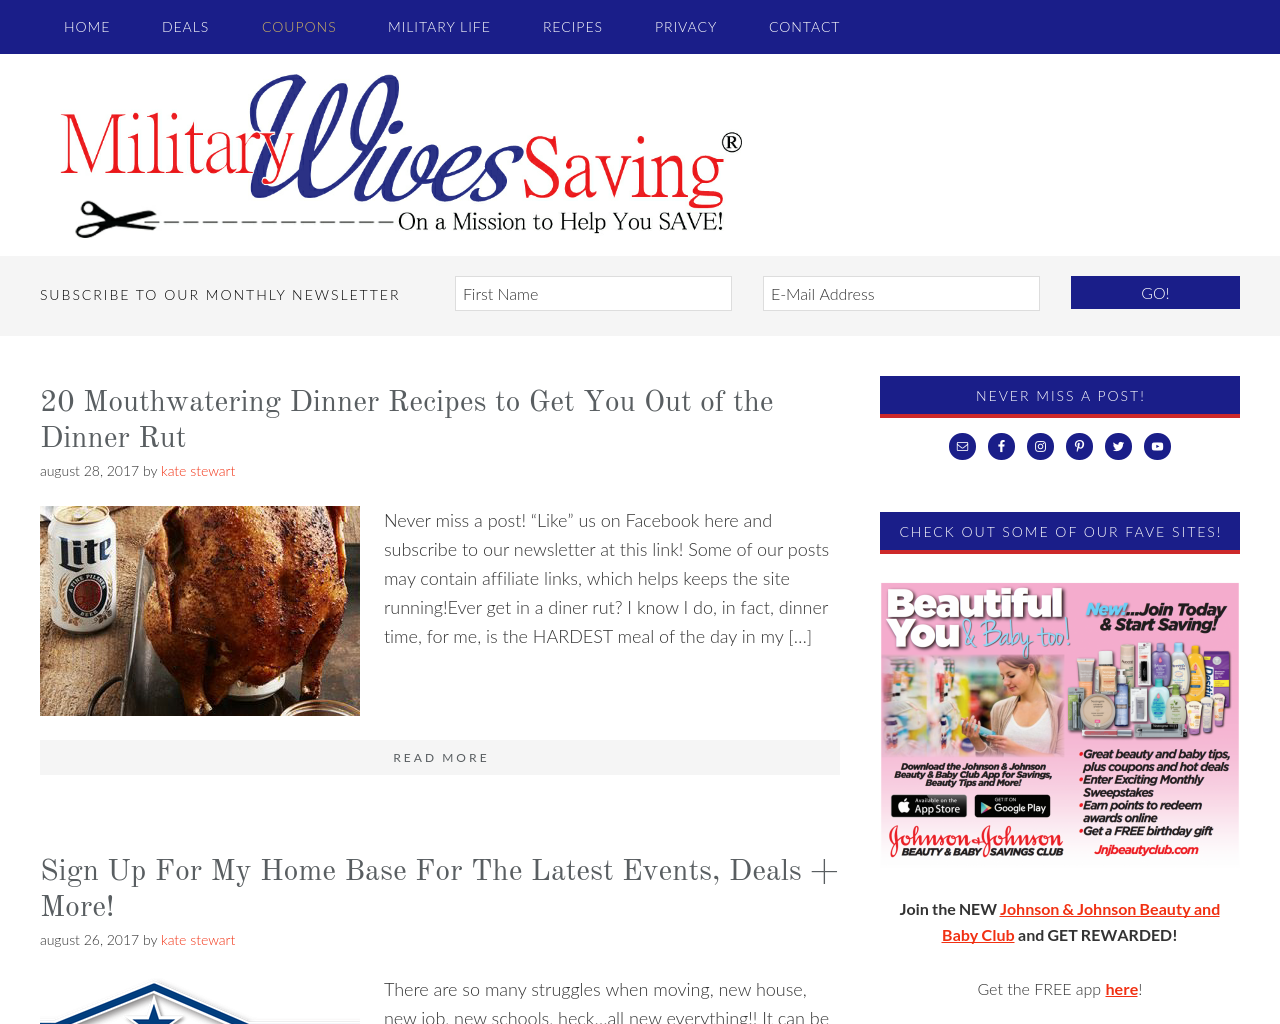 Military-Wives-Saving-Advertising-Reviews-Pricing